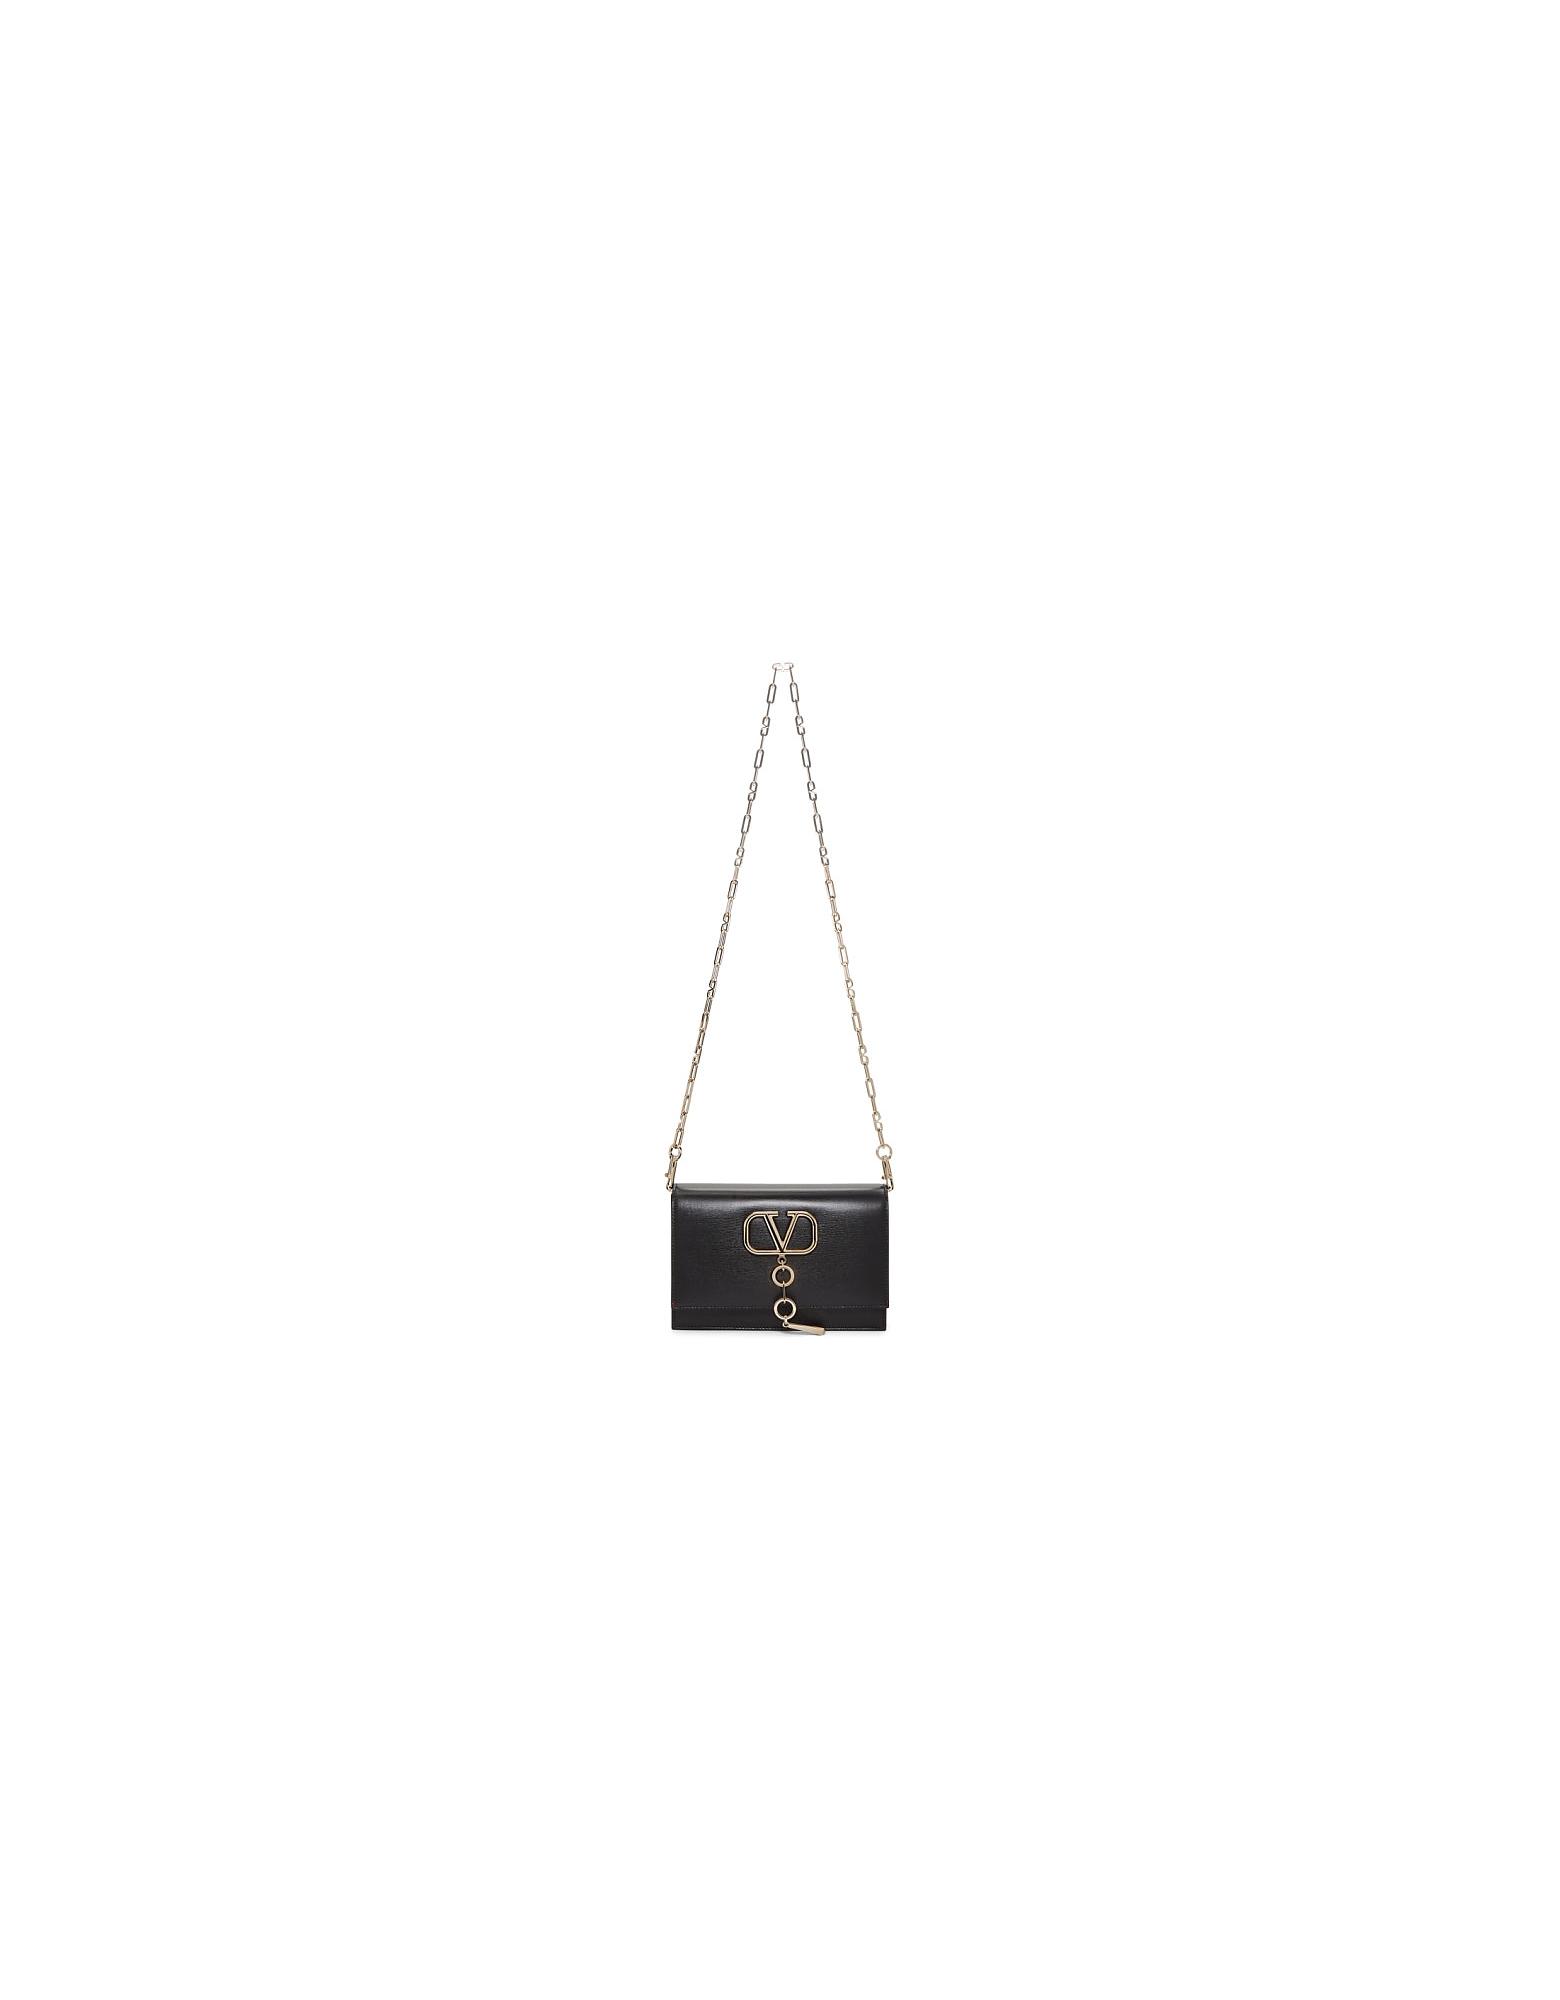 Valentino Designer Handbags, Black Valentino Garavani Small VLogo Shoulder Bag